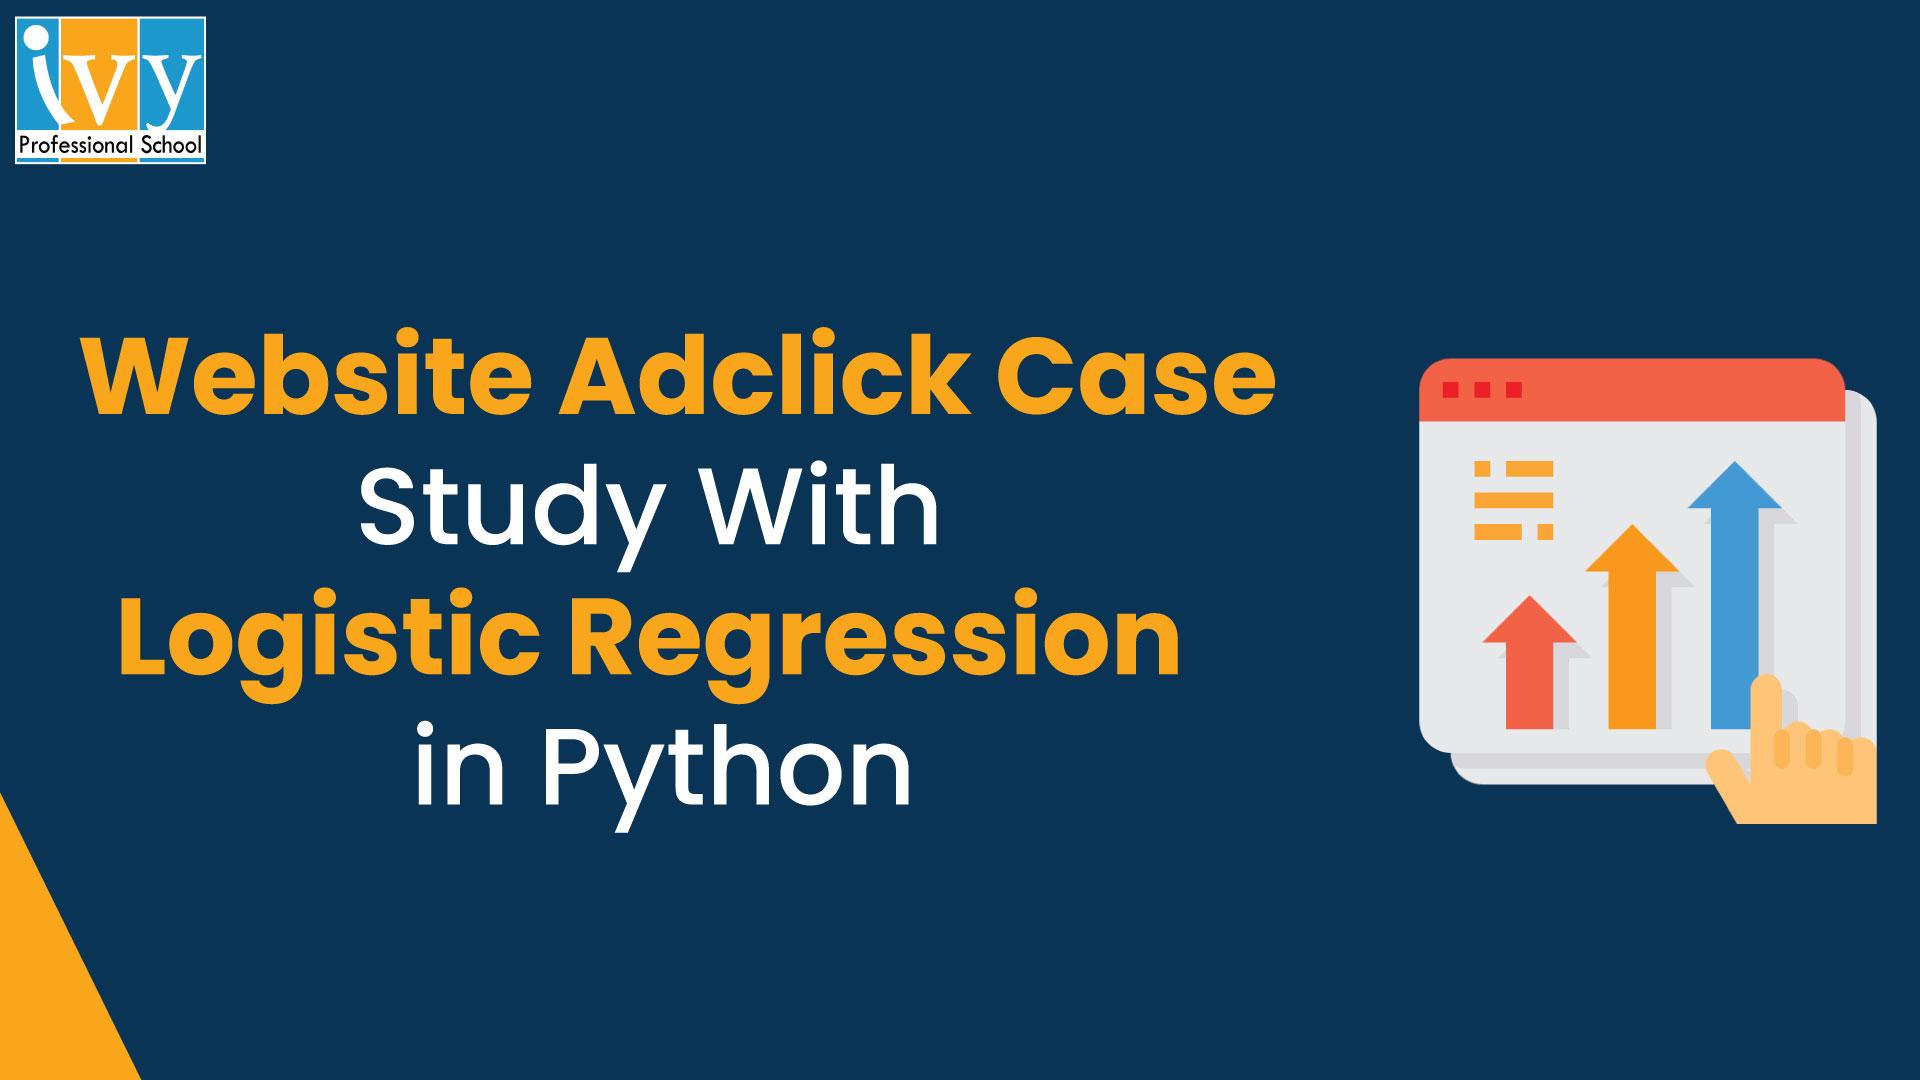 Adclick Case Study - Ivy Pro School